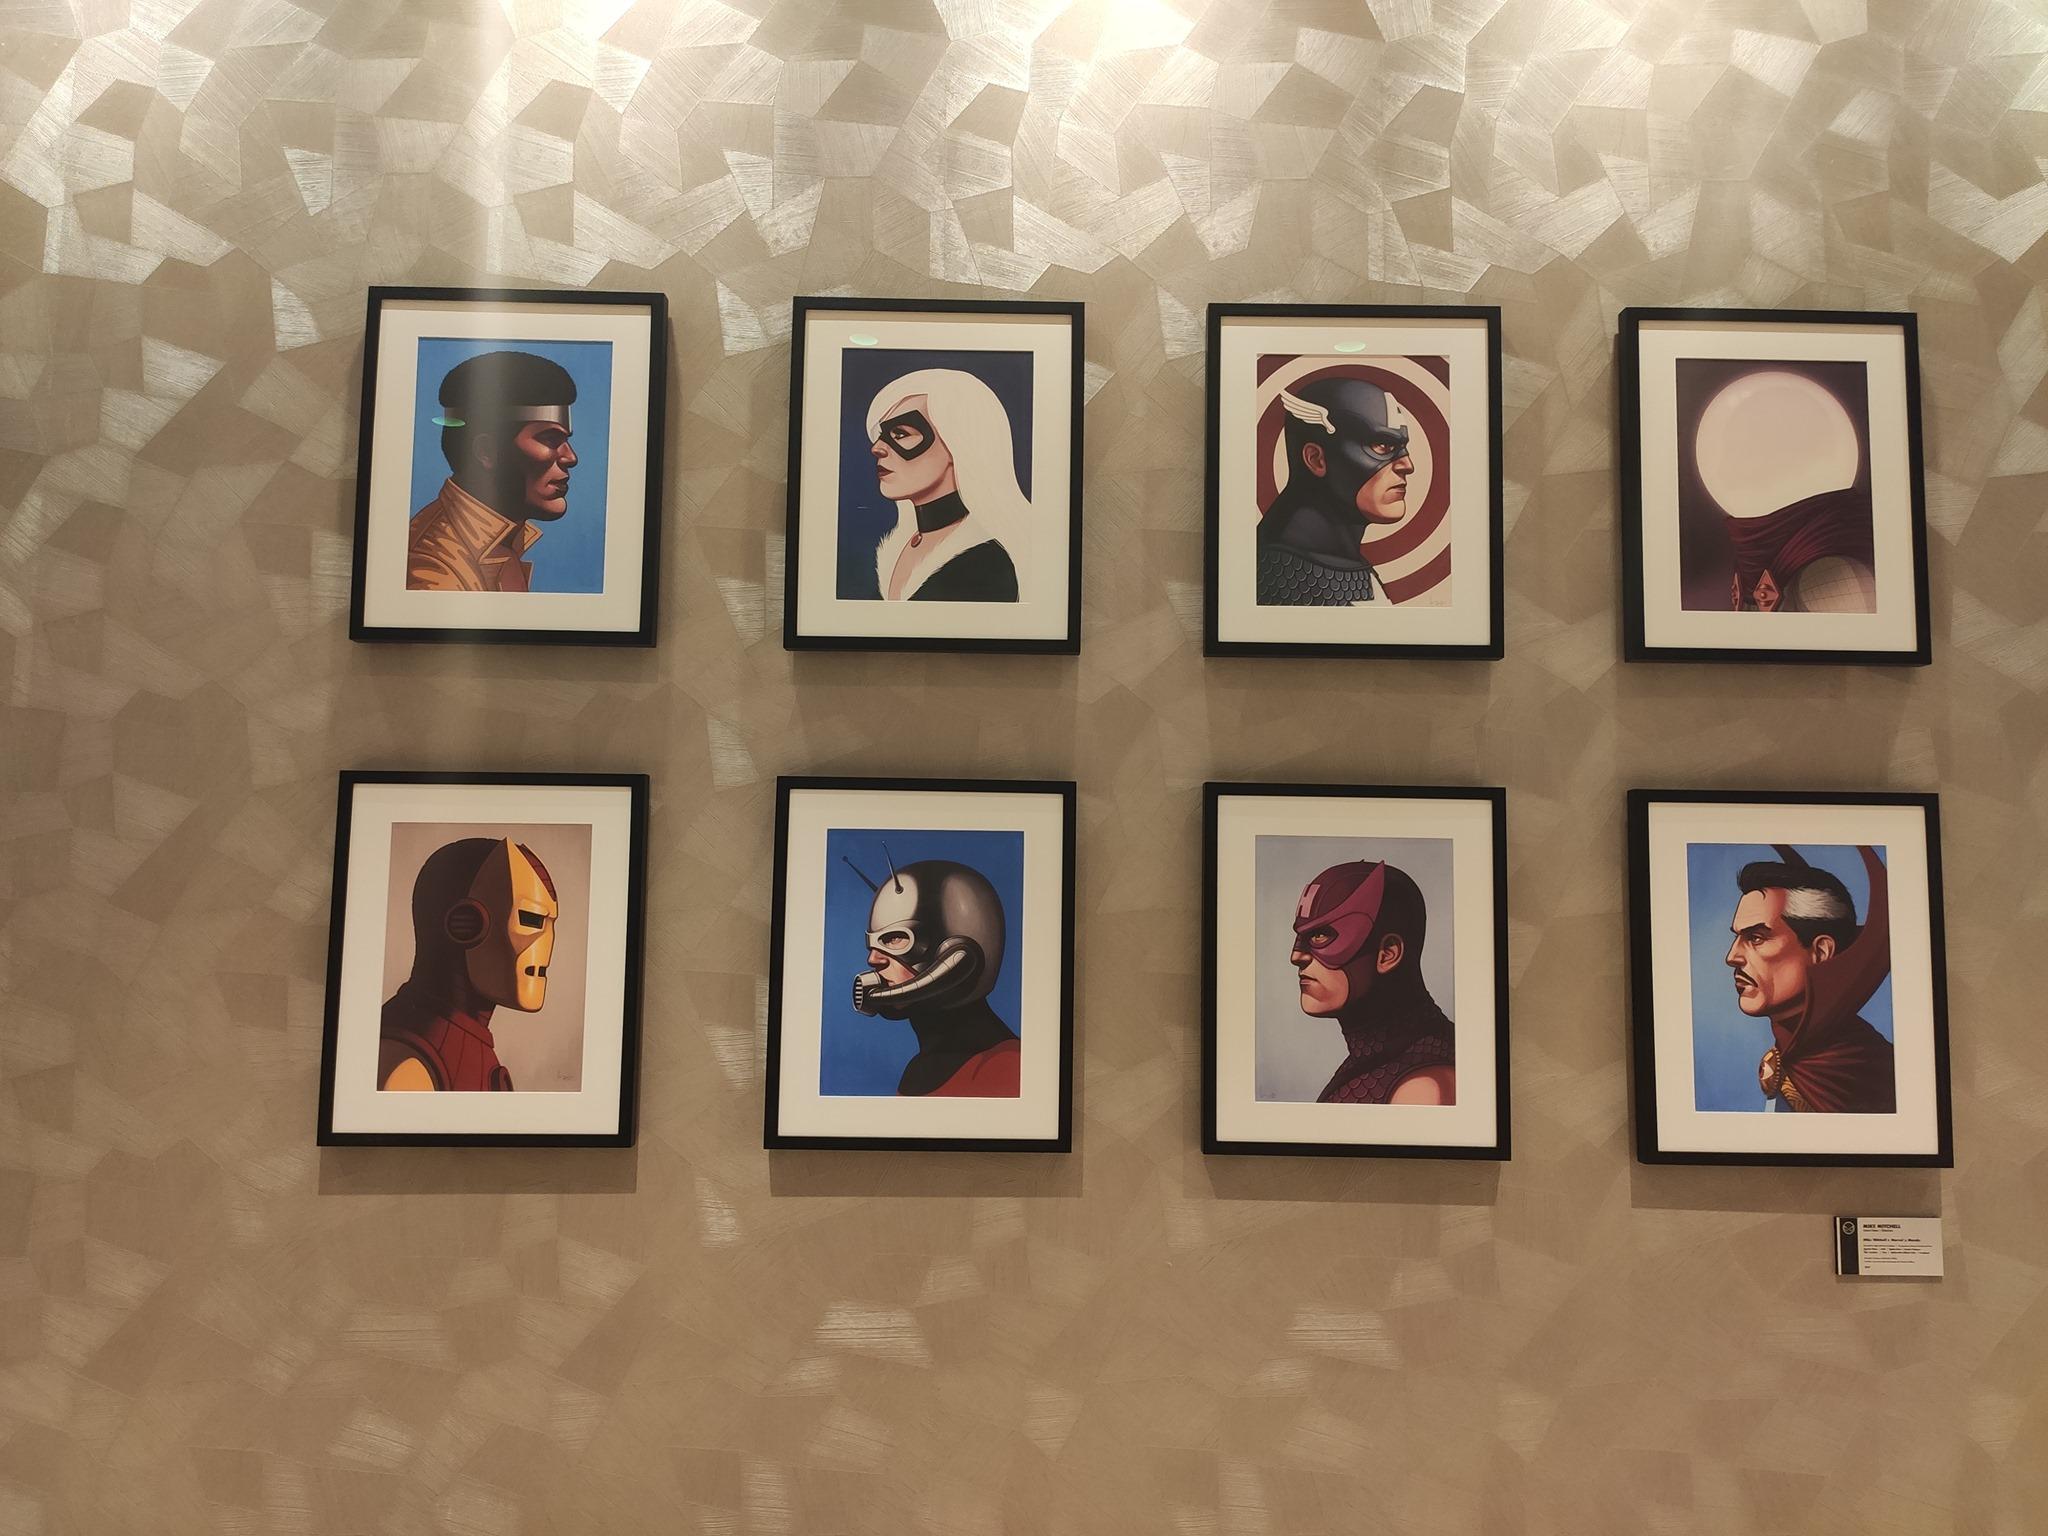 Couloir bas - Disney's Hotel New York - The Art of Marvel